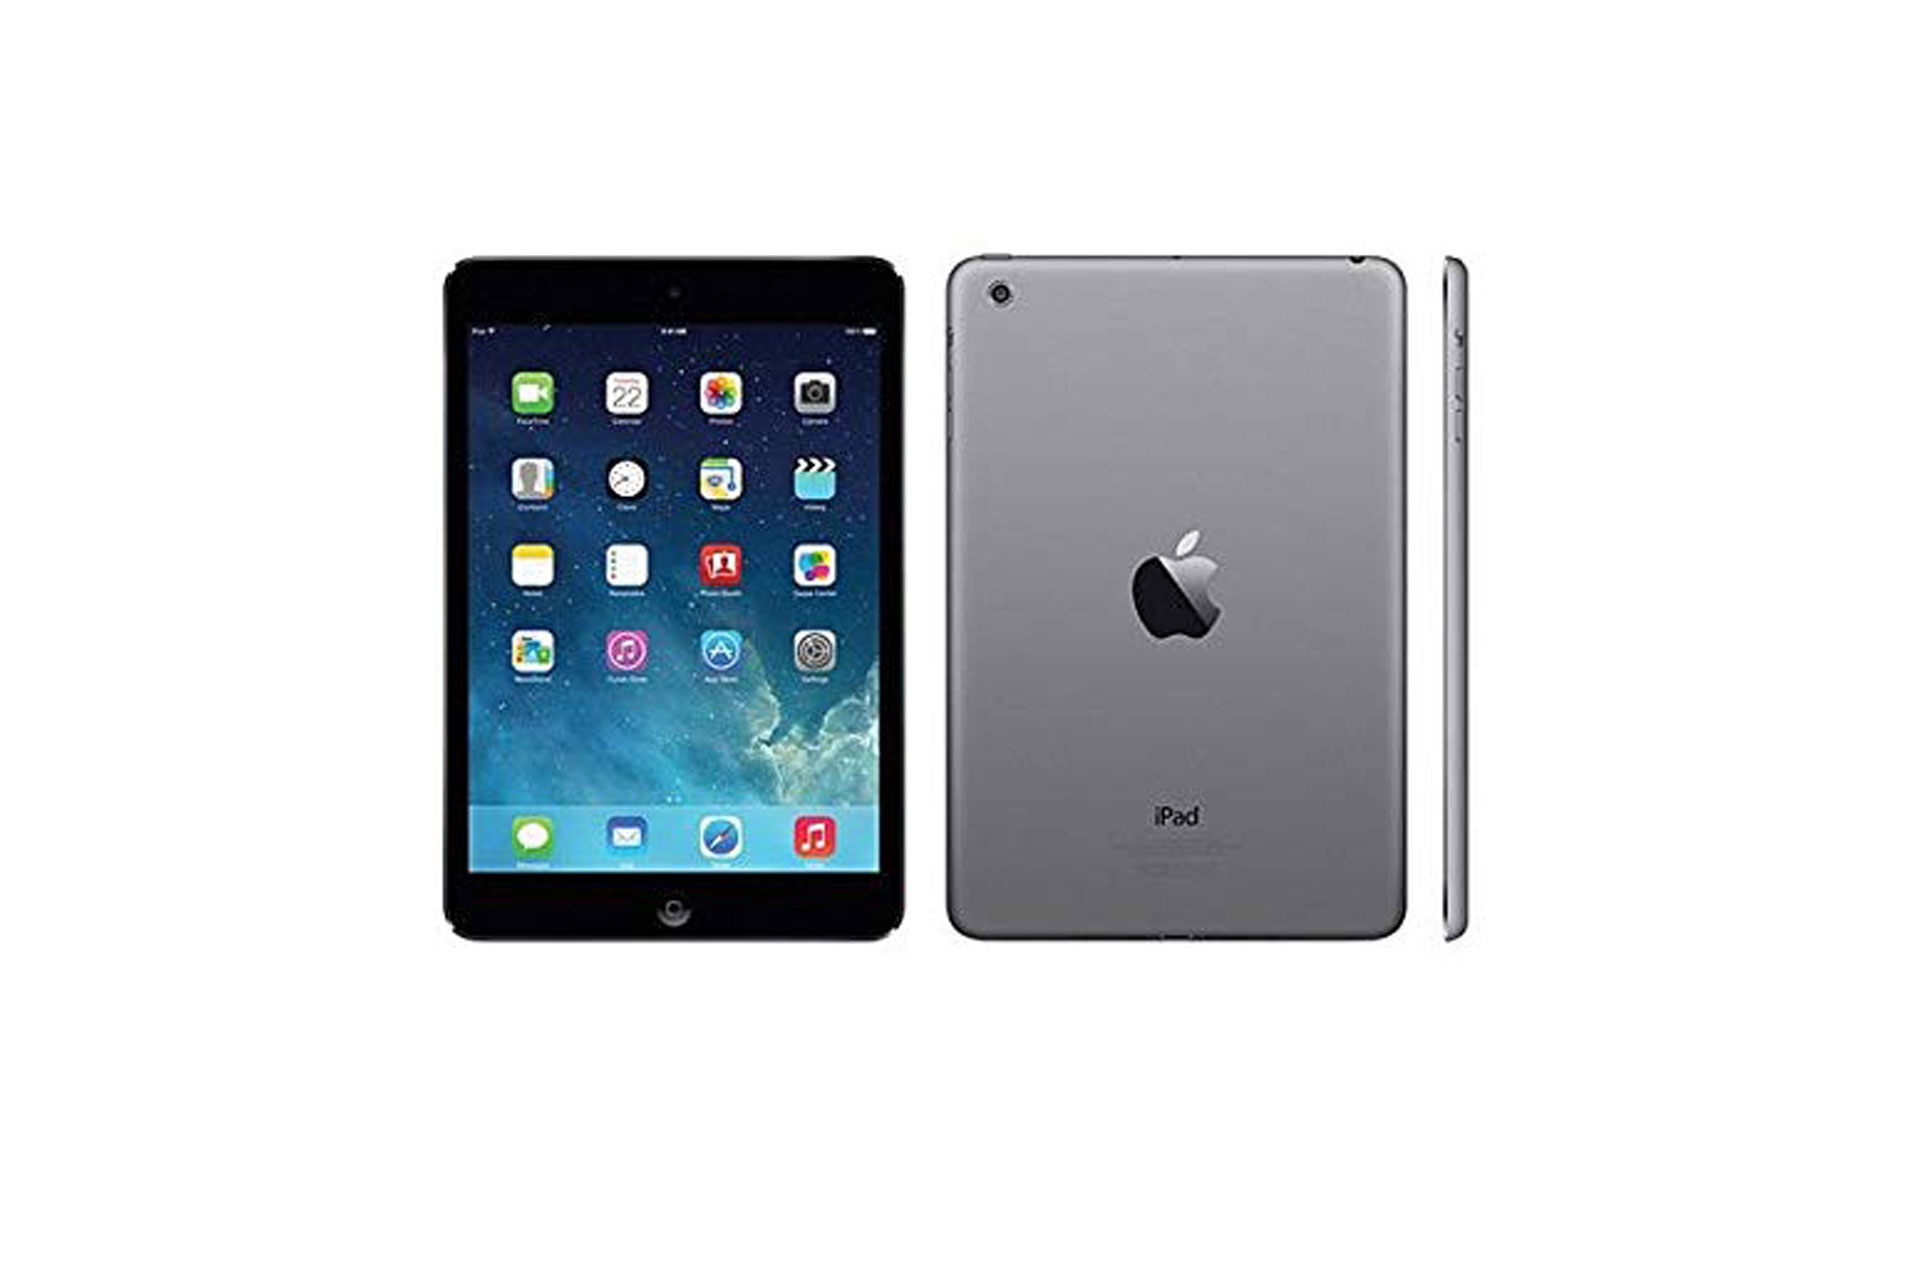 iPad; Courtesy of Amazon